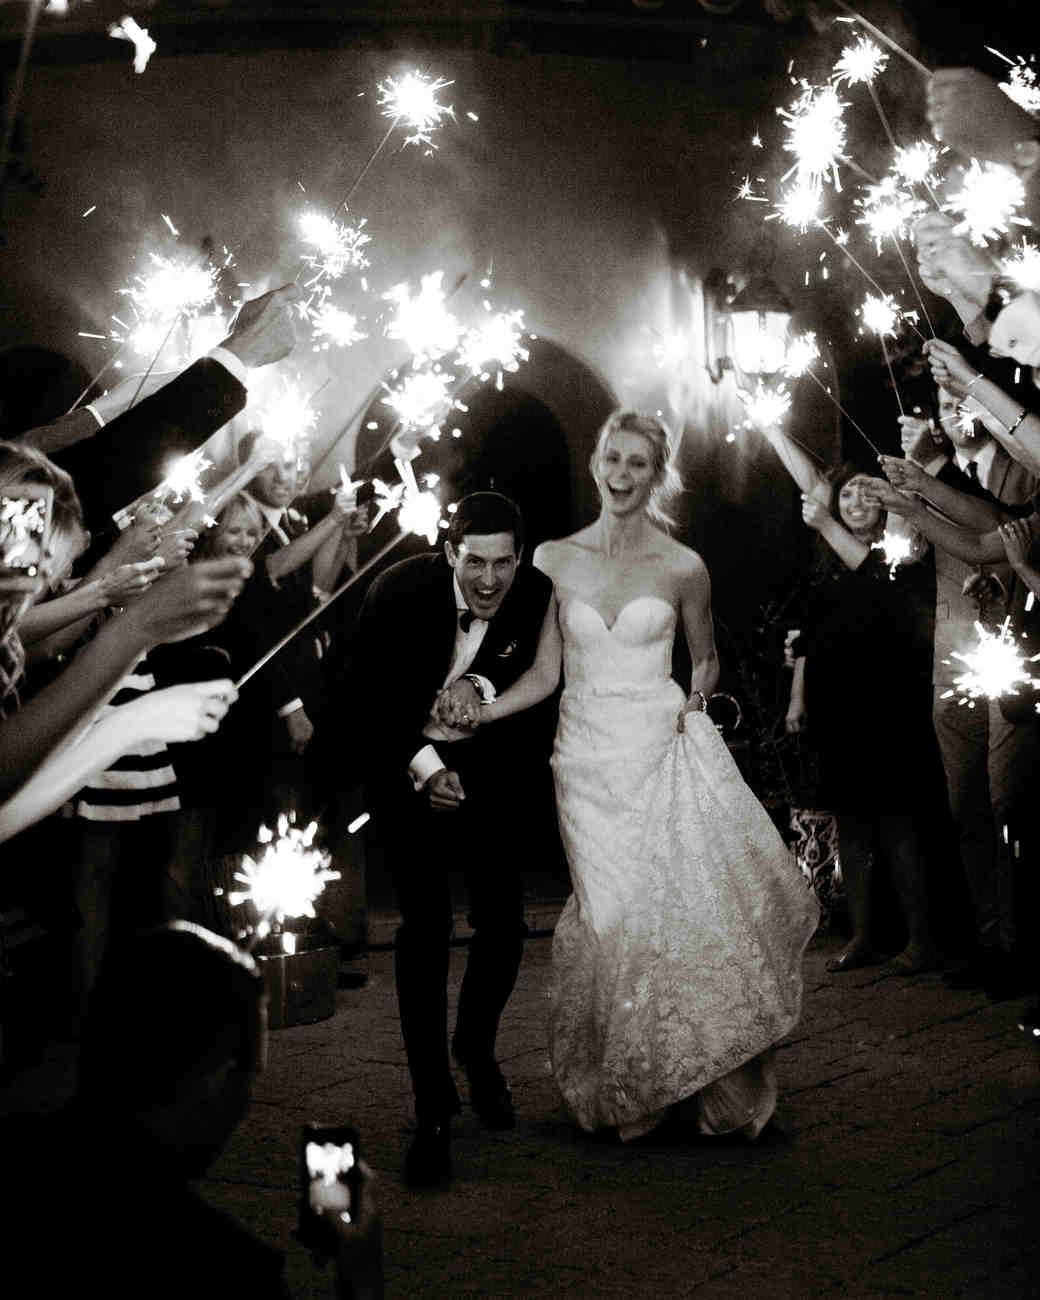 Wedding Strapless Dress Falls Down